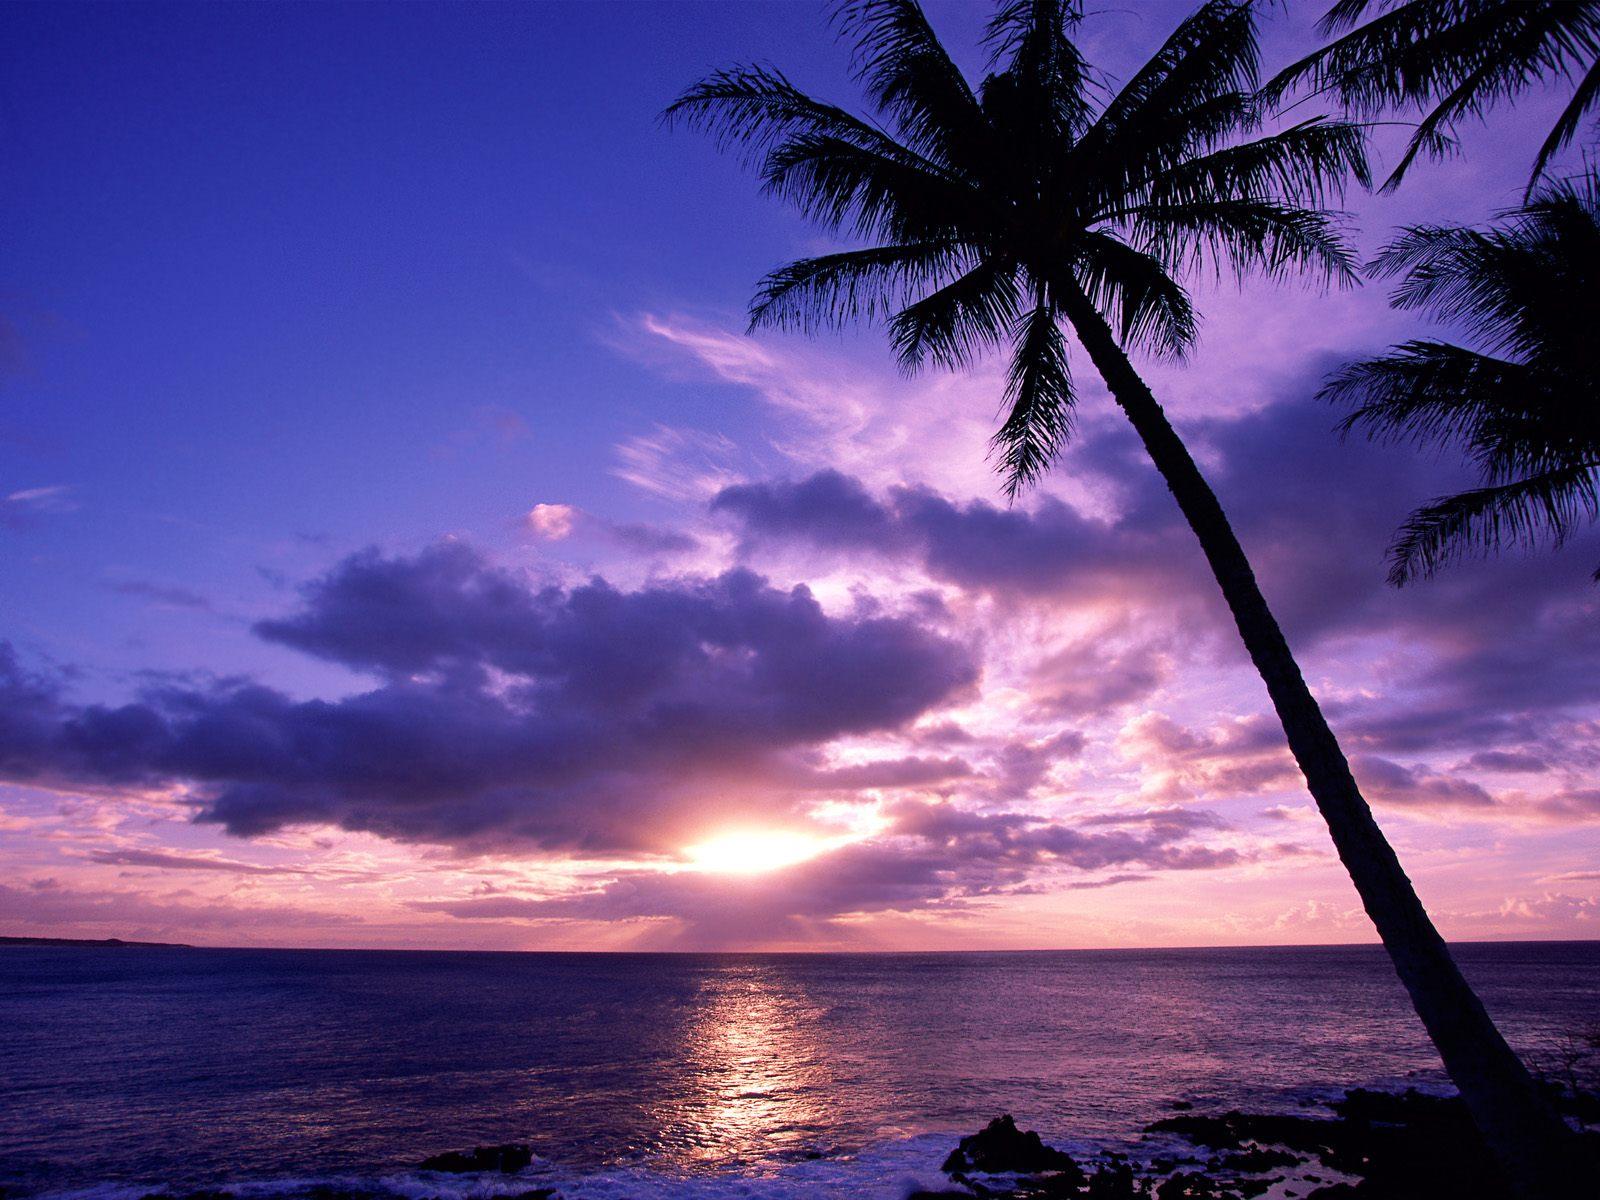 Download sea Beach Islands Beautiful WallpapersDesktop Backgrounds 1600x1200